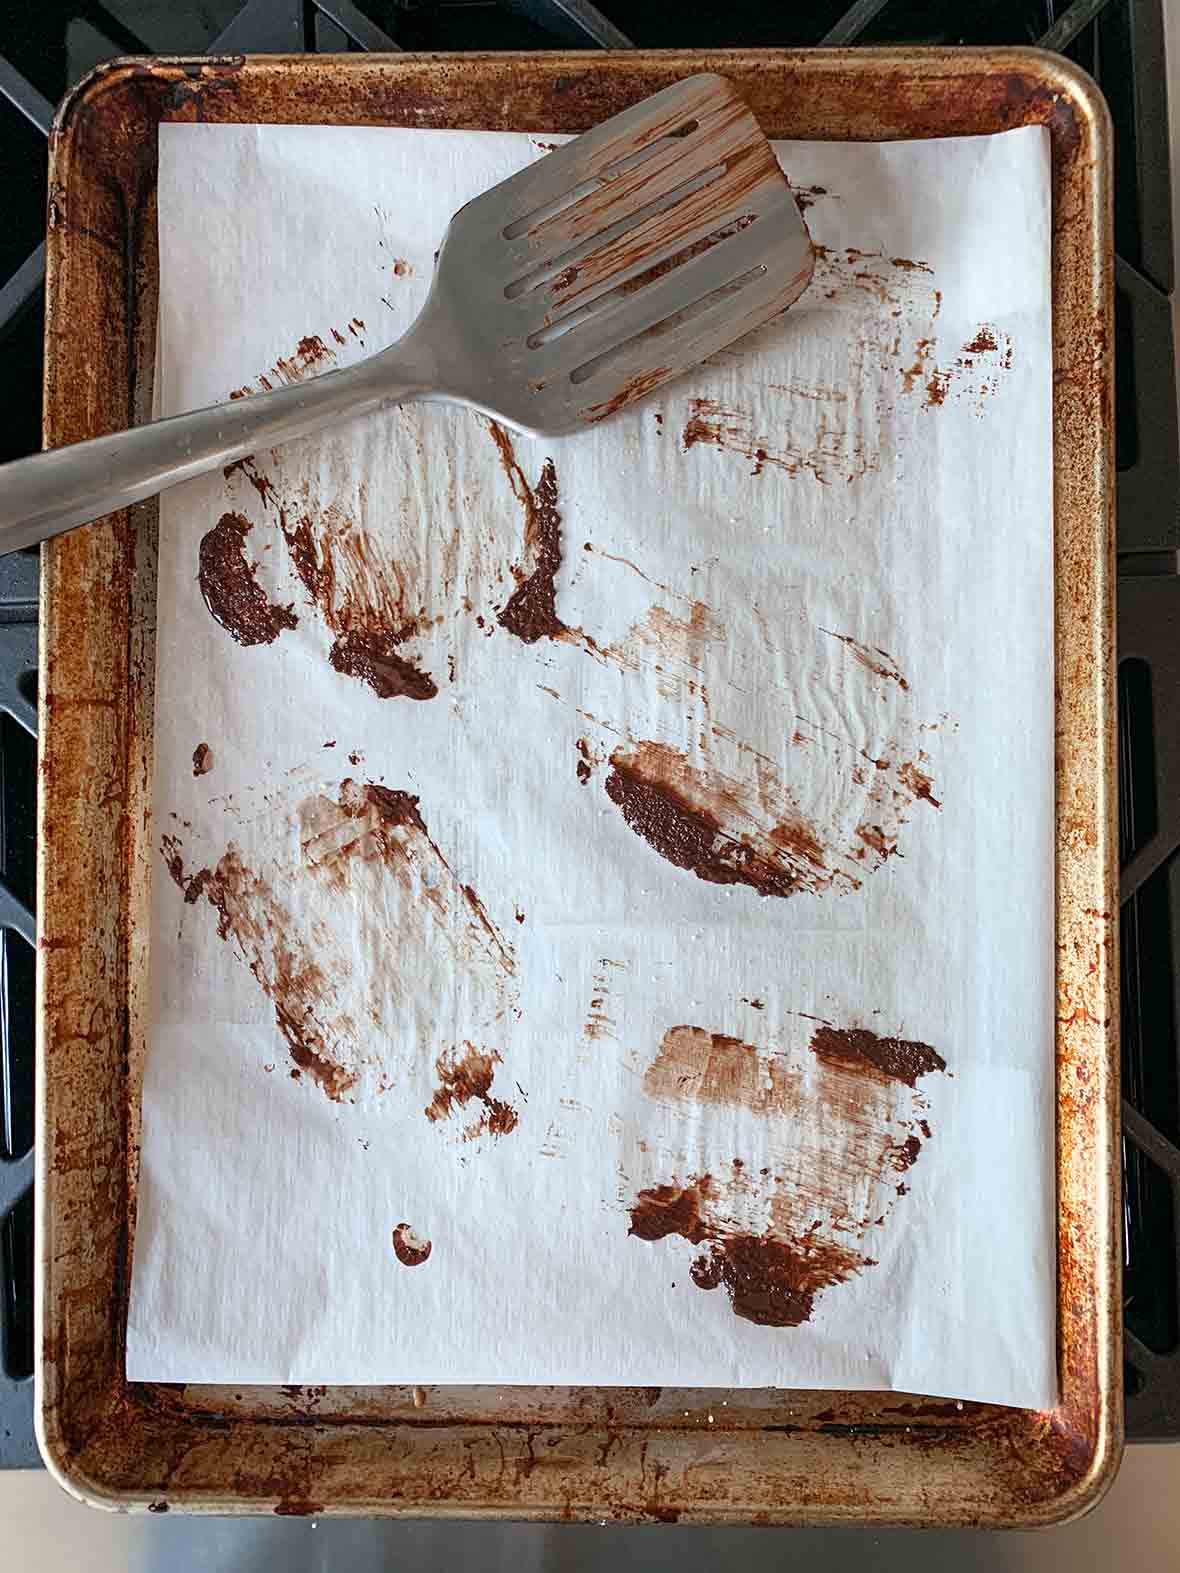 David Leite S Chocolate Chip Cookies